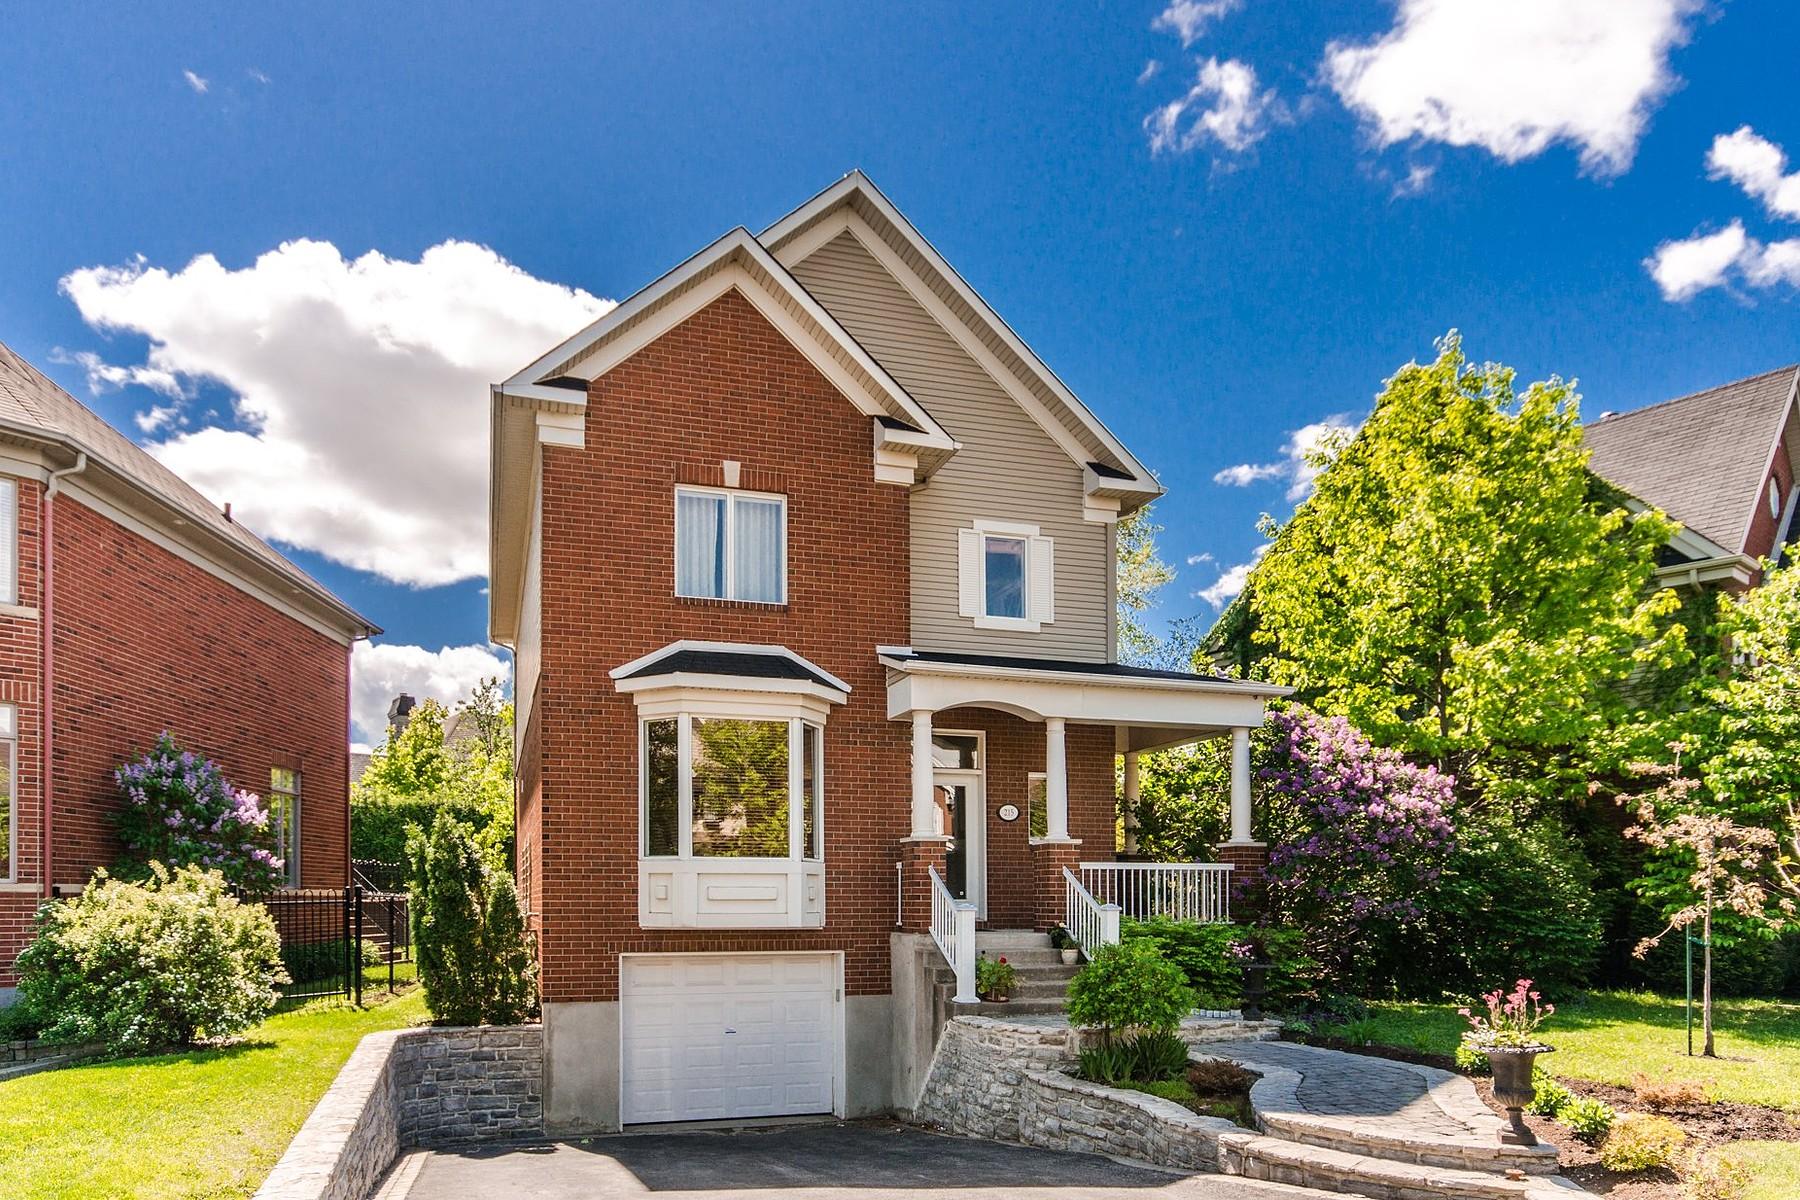 Altro tipo di proprietà per Vendita alle ore Saint-Lambert, Montérégie 215 Rue Upper Edison Saint-Lambert, Quebec J4R2V8 Canada